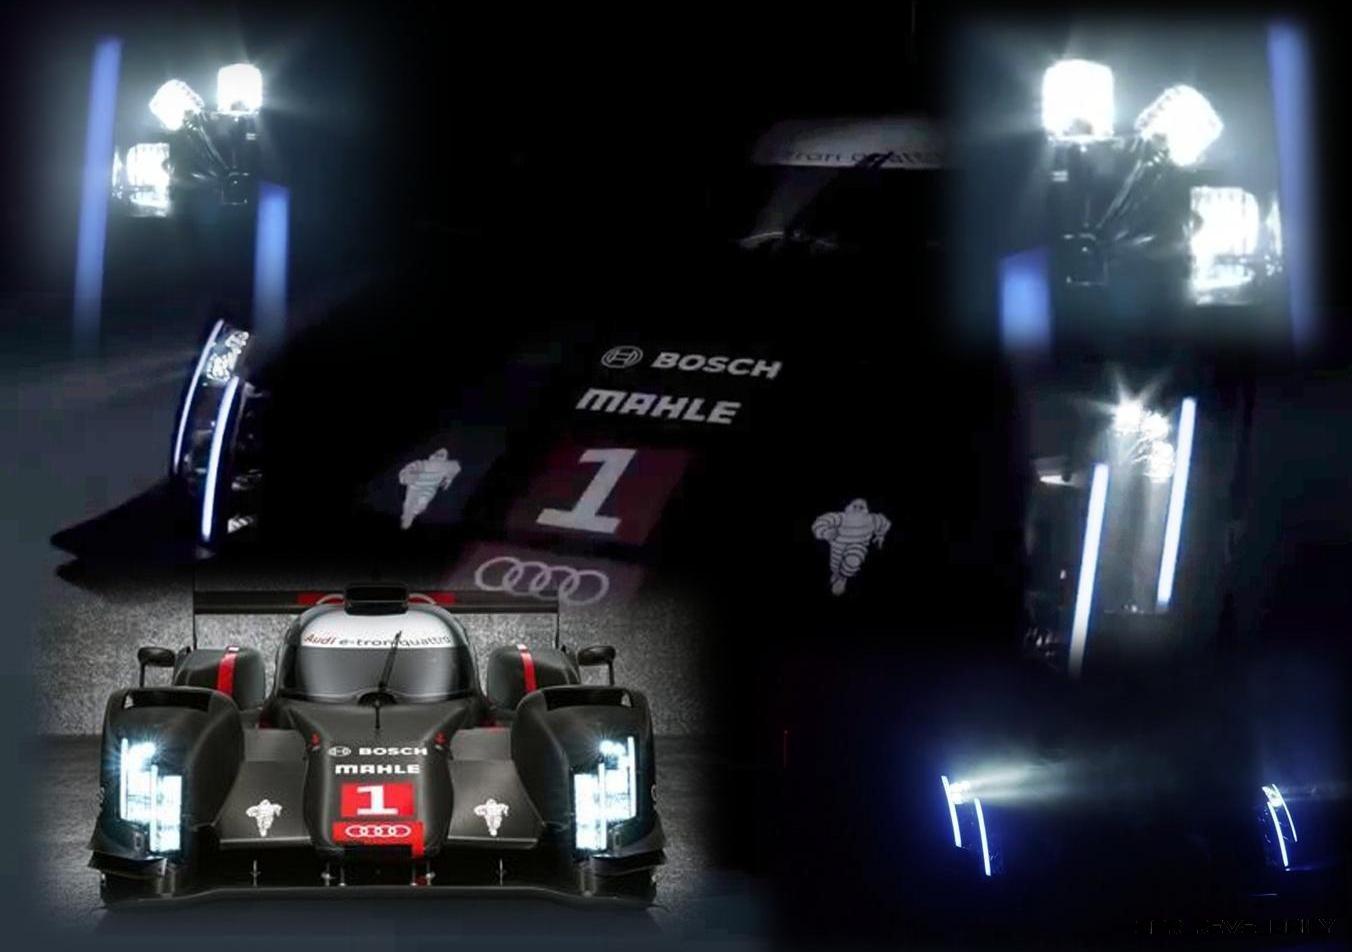 CarRevsDaily.com - 2014 Audi R18 LeMans LaserLight Article Header Graphic